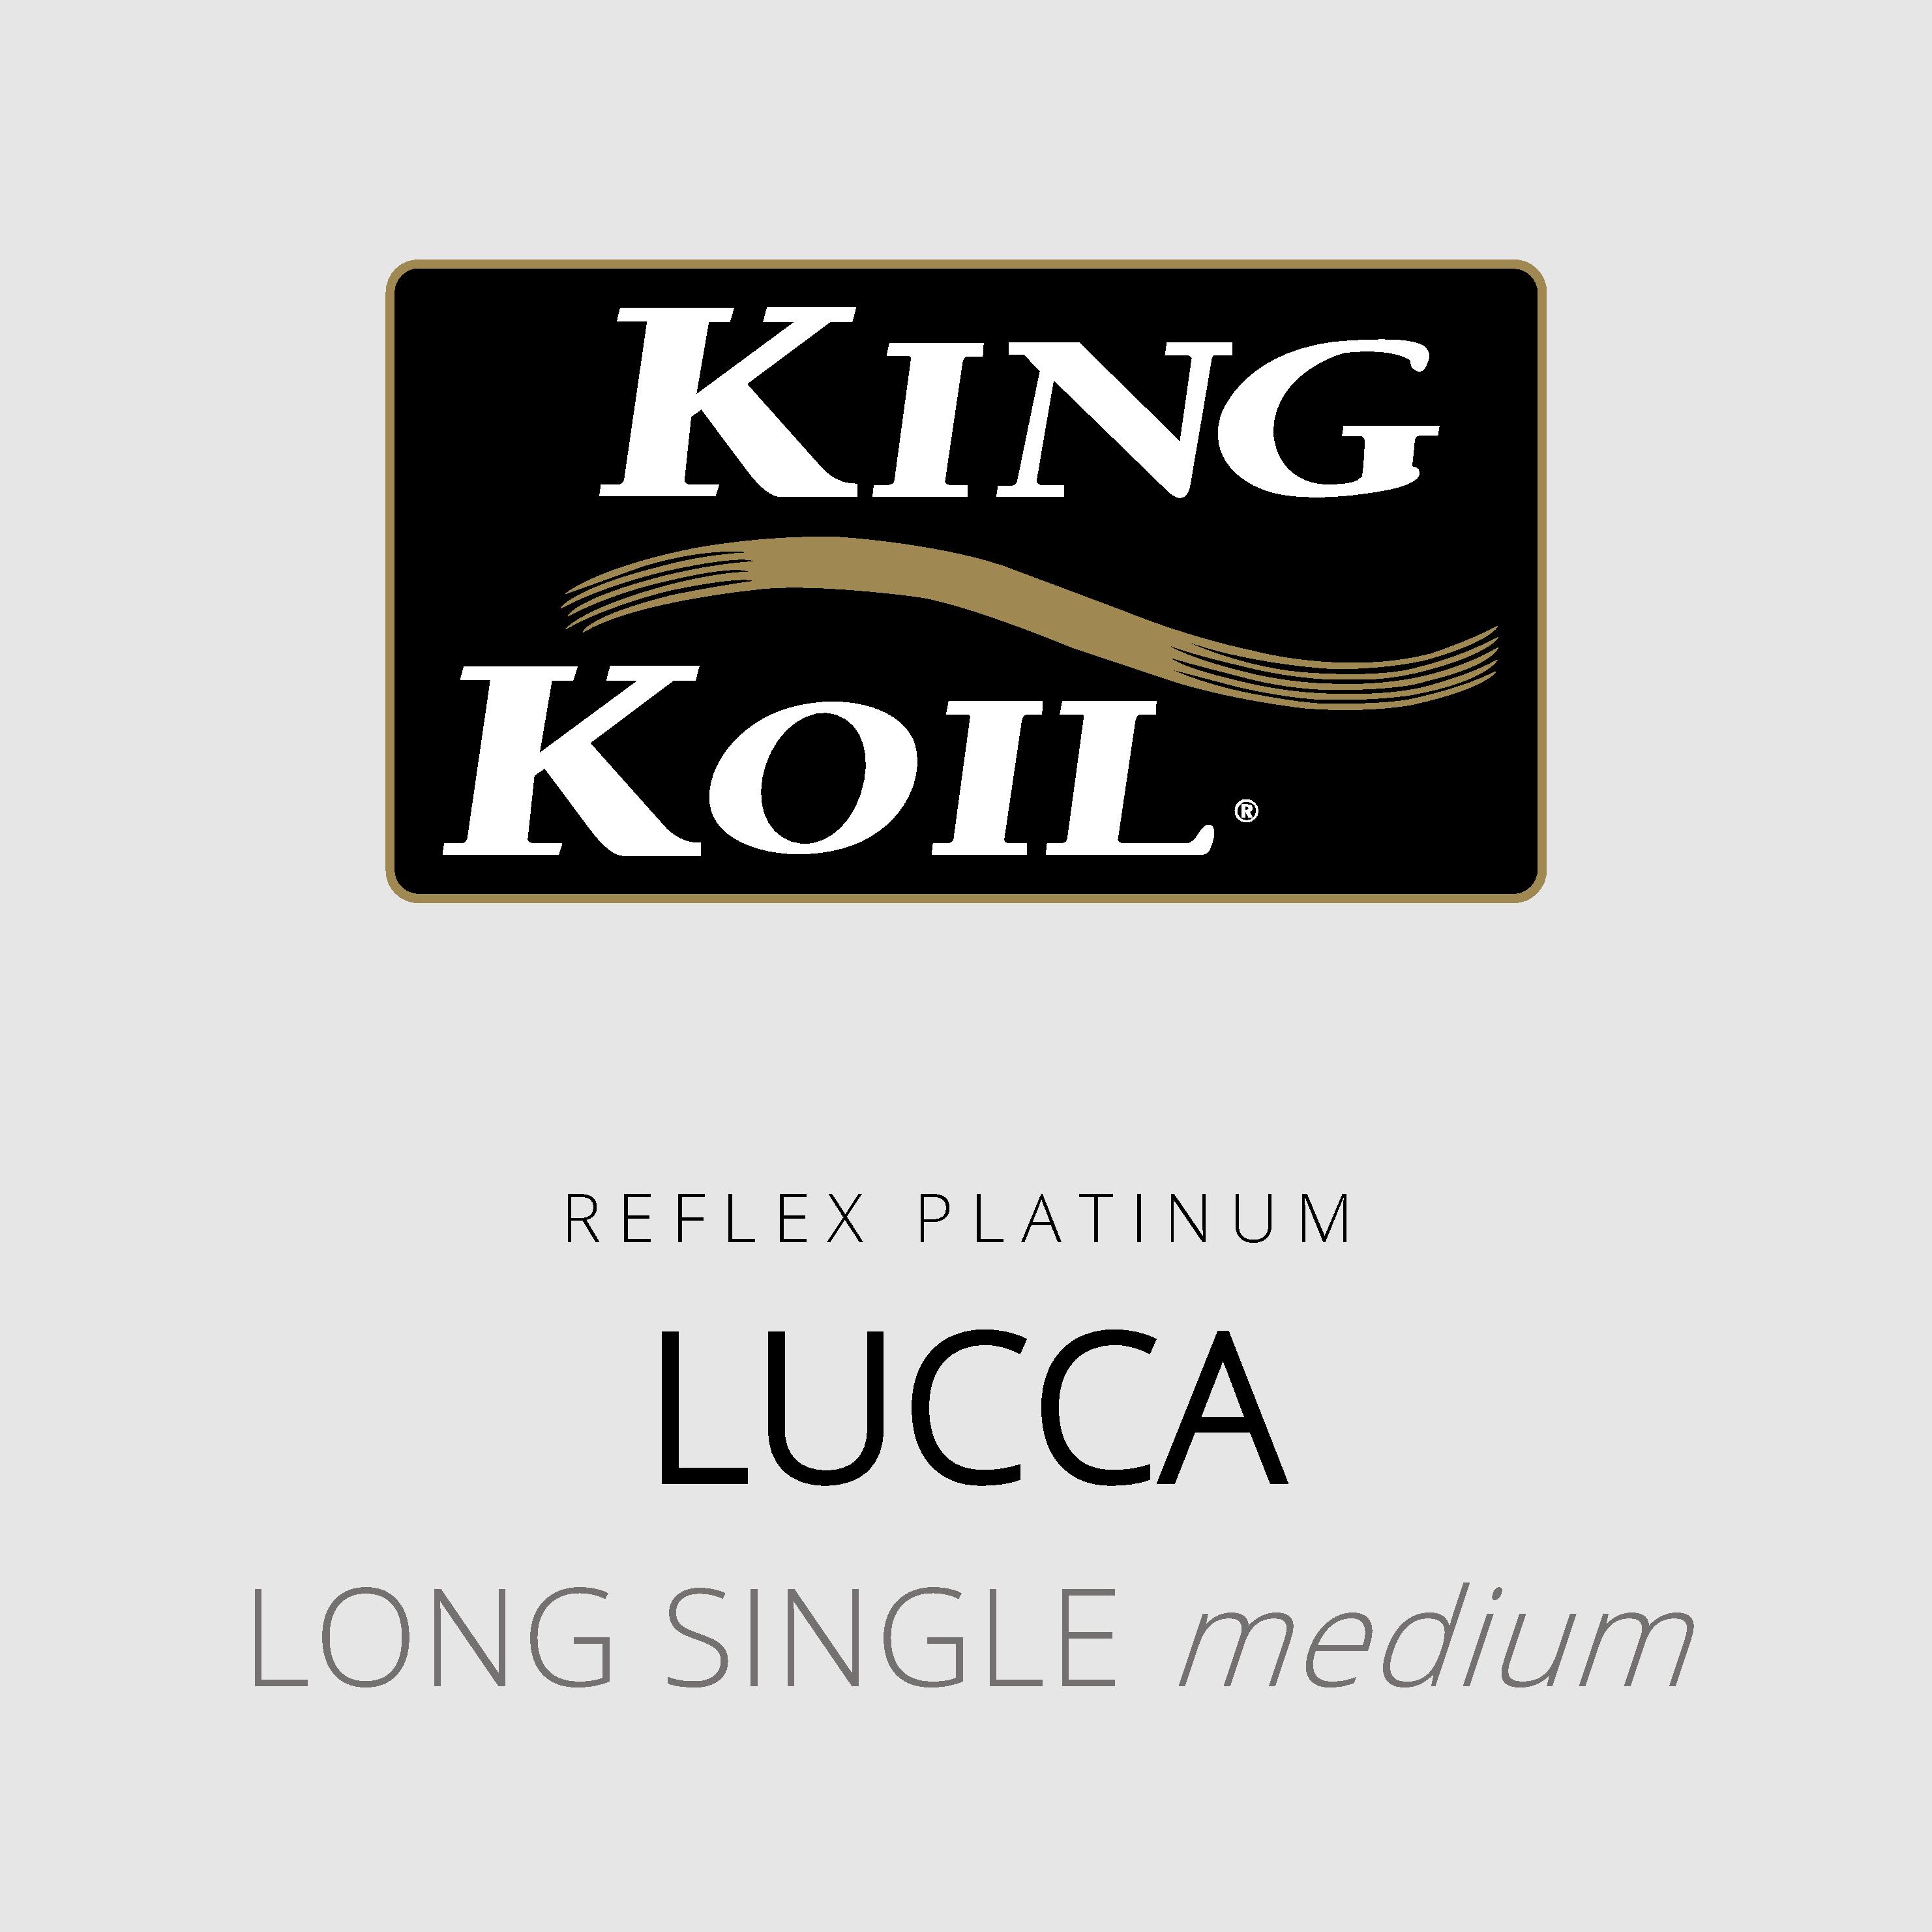 King Koil – Lucca – Reflex Platinum – Long Single Medium Mattress